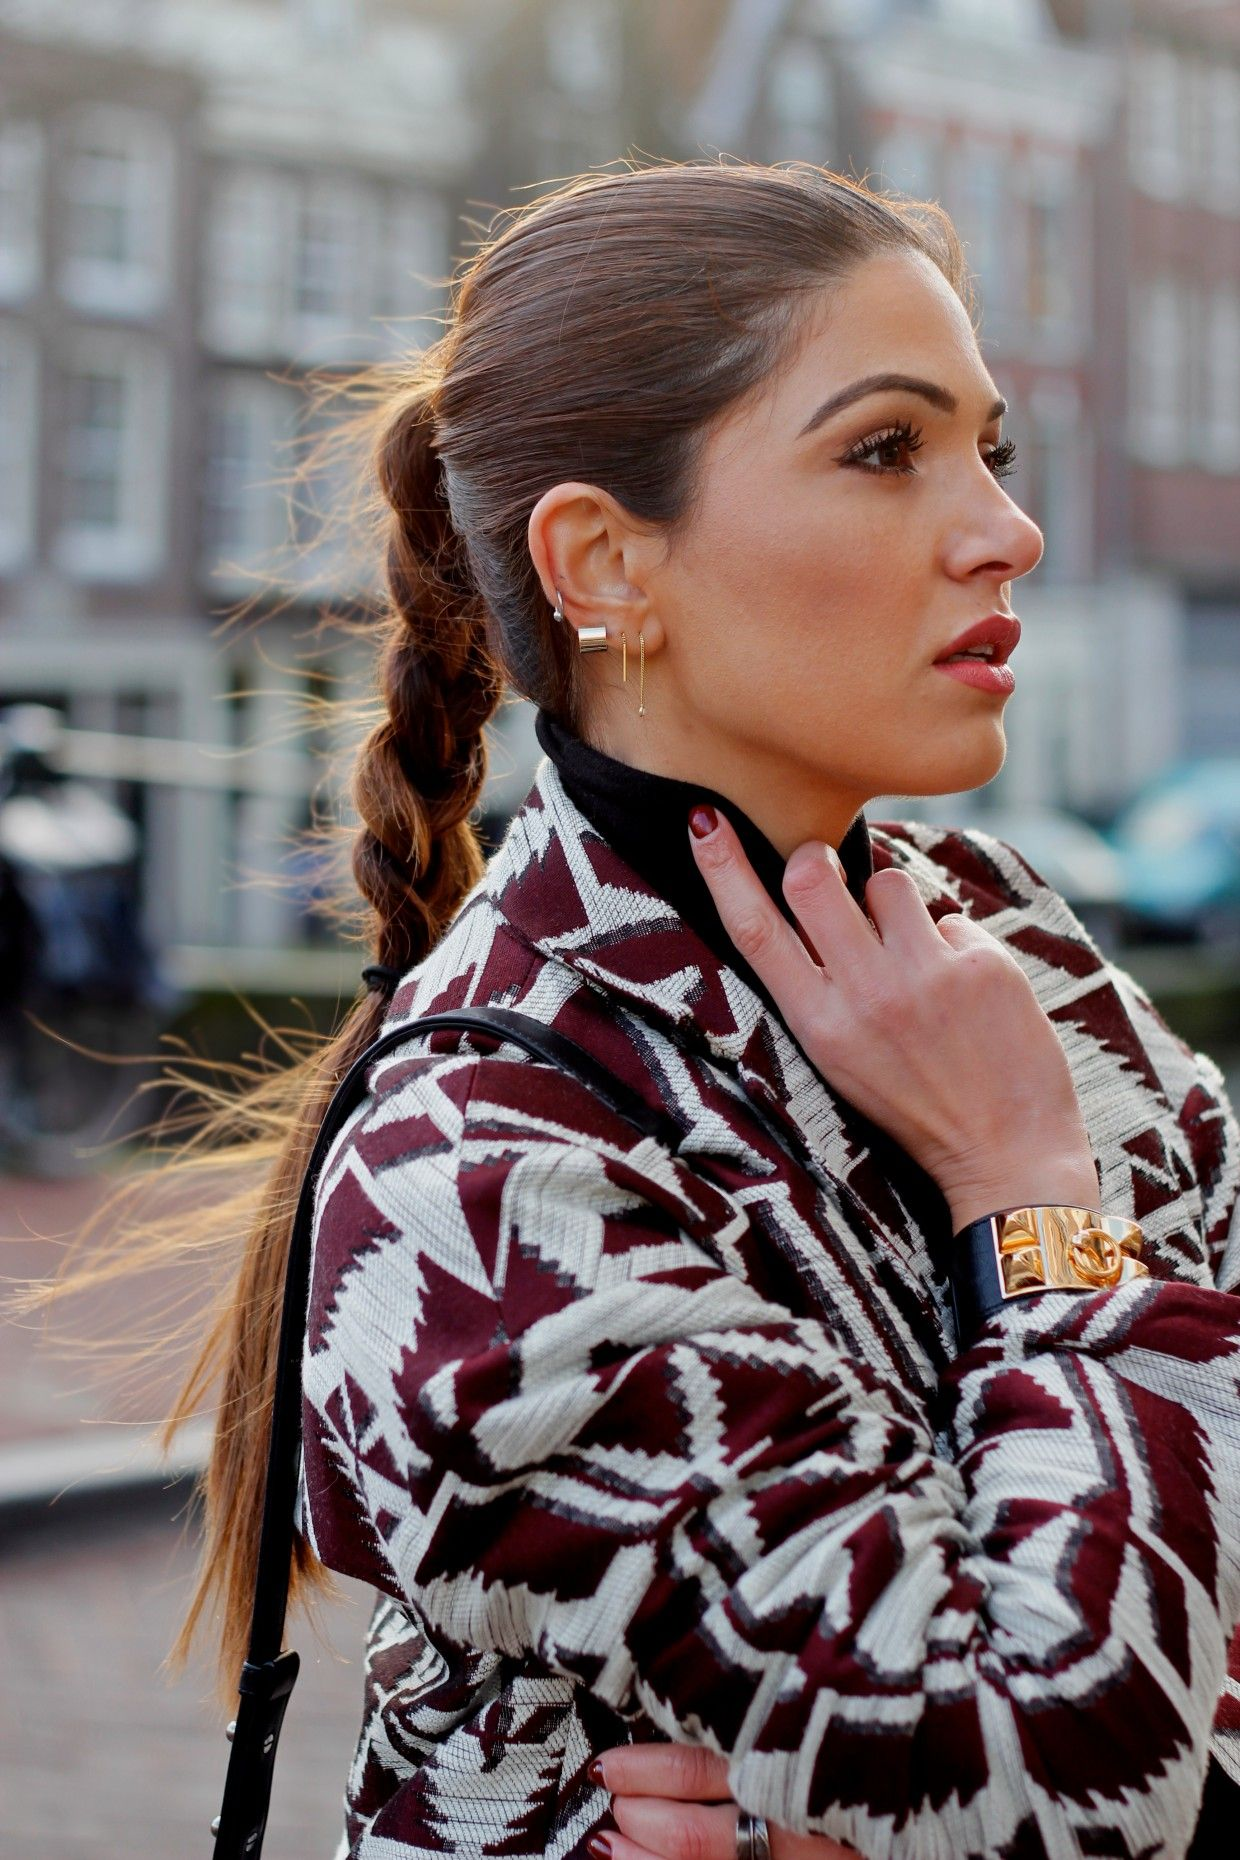 Maroon Printed Coat and a Braid | Negin Mirsalehi